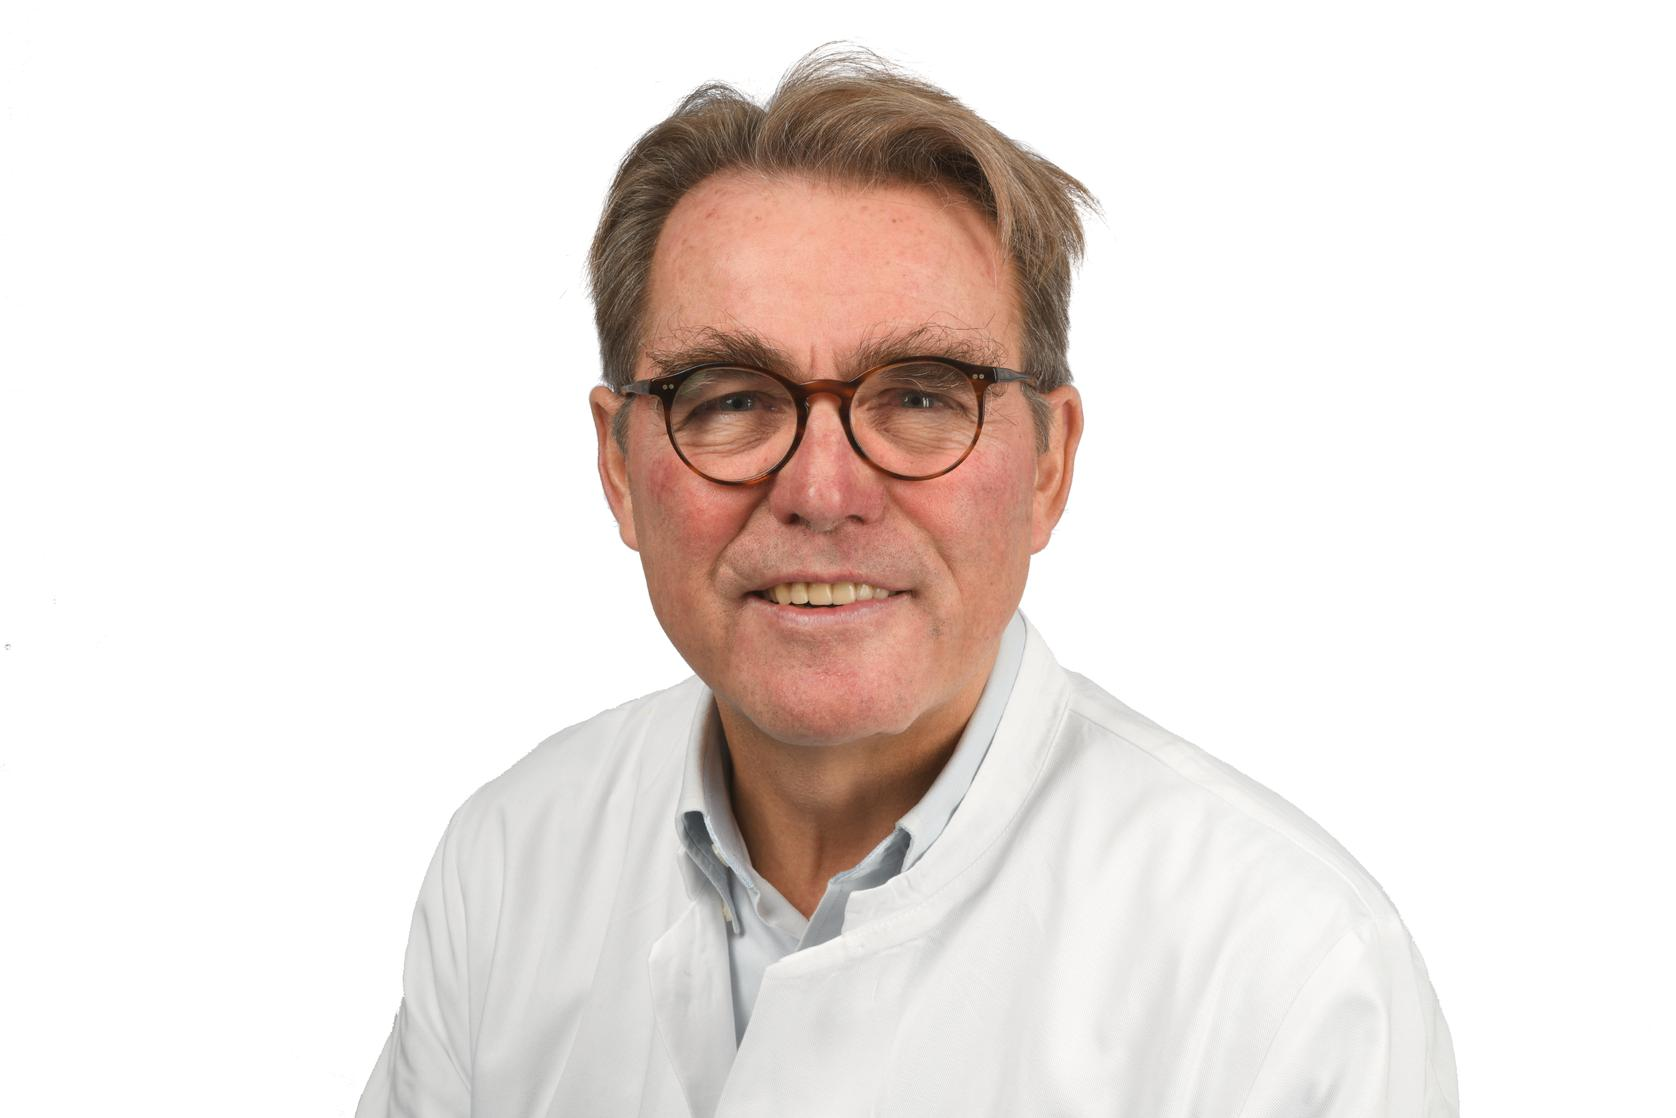 Univ.-Prof. Dr. med. Christian J. Thaler, Leiter des Hormon- und Kinderwunschzentrums